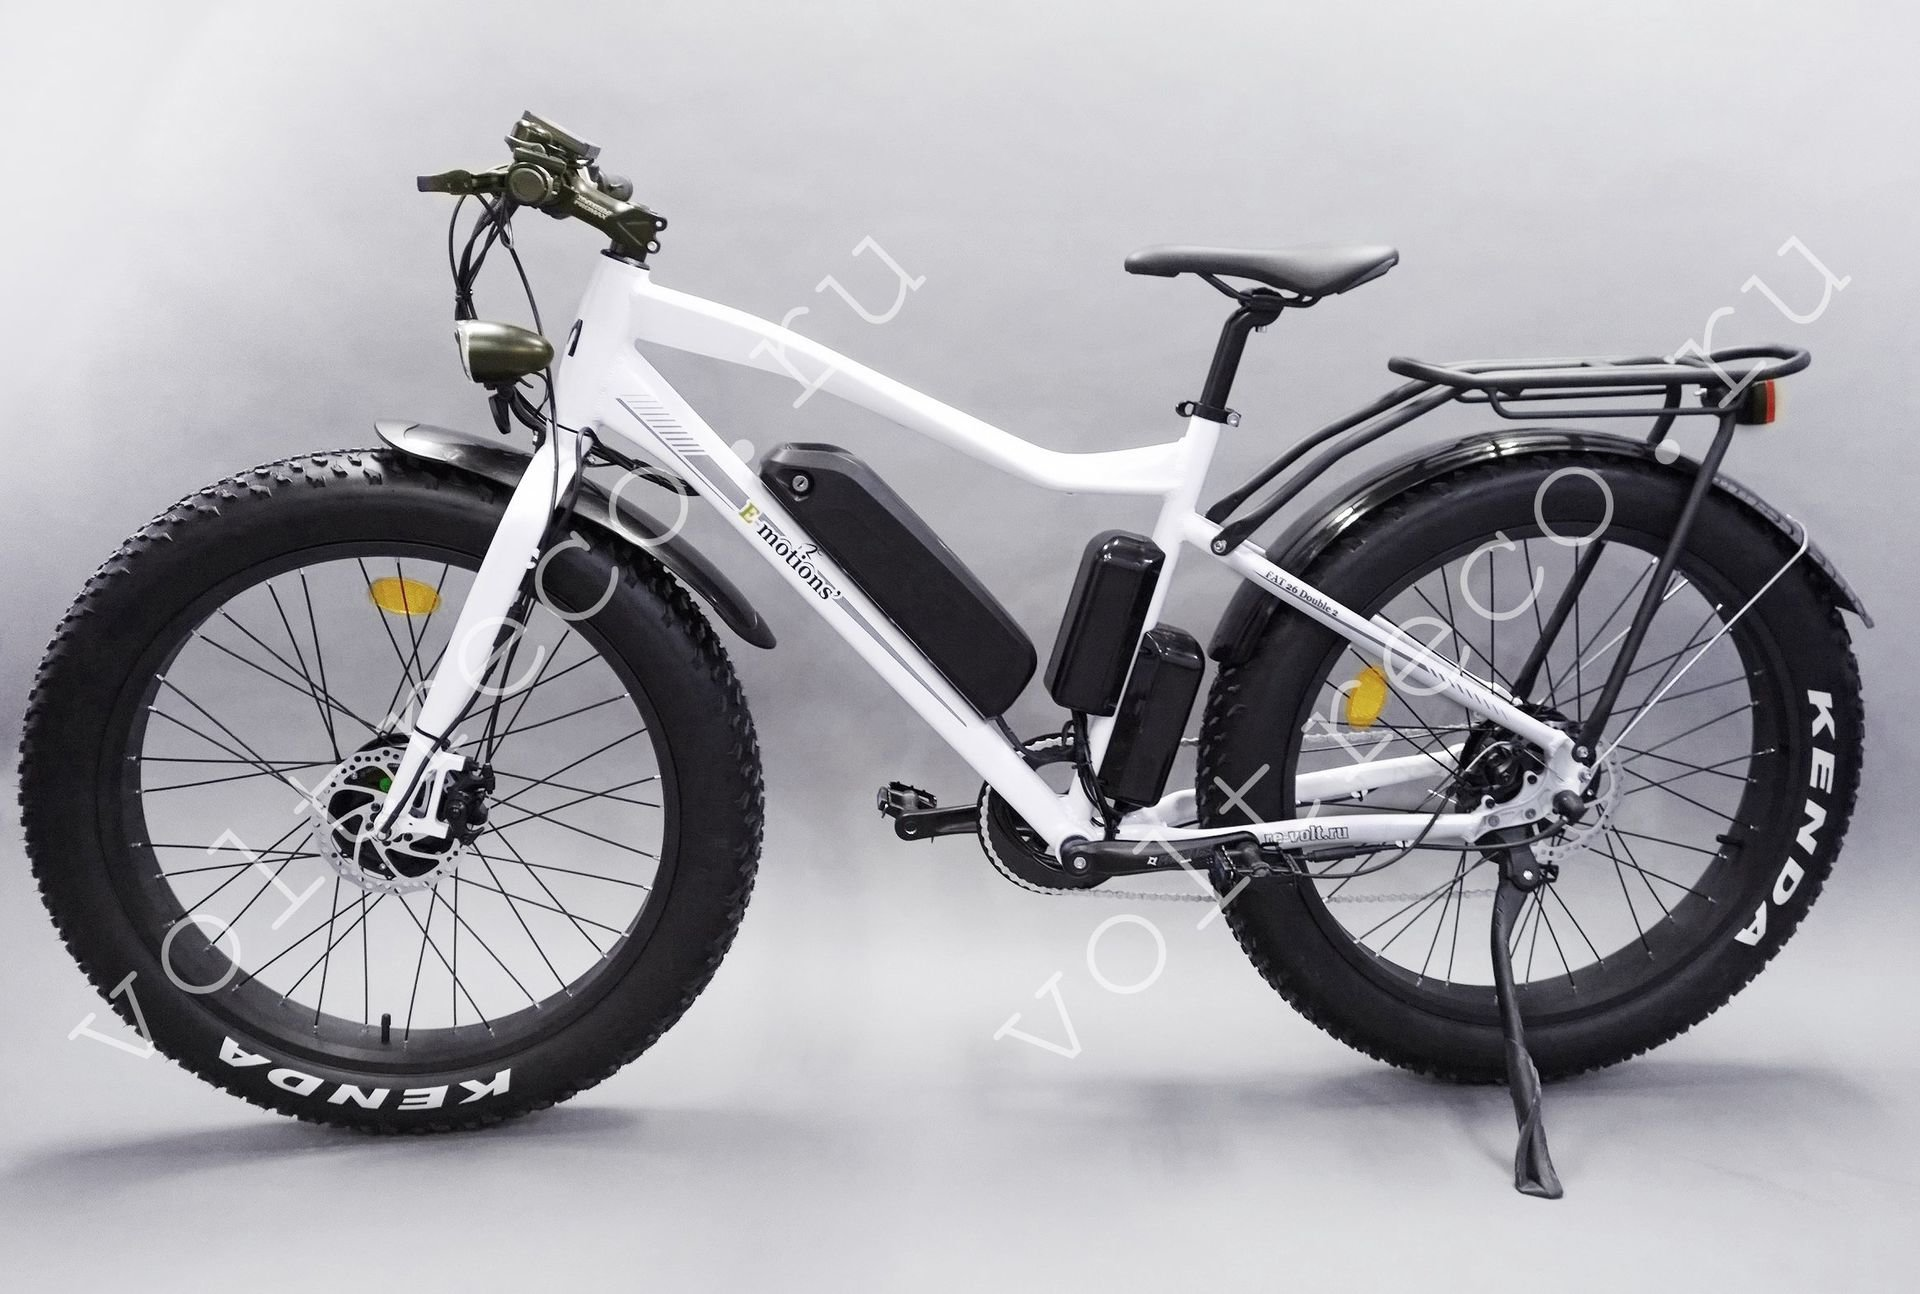 Электровелосипед (Фэтбайк) E-motions FAT 26 Double 2 1000w 48v (2 х 500w 48V, 10Ah)